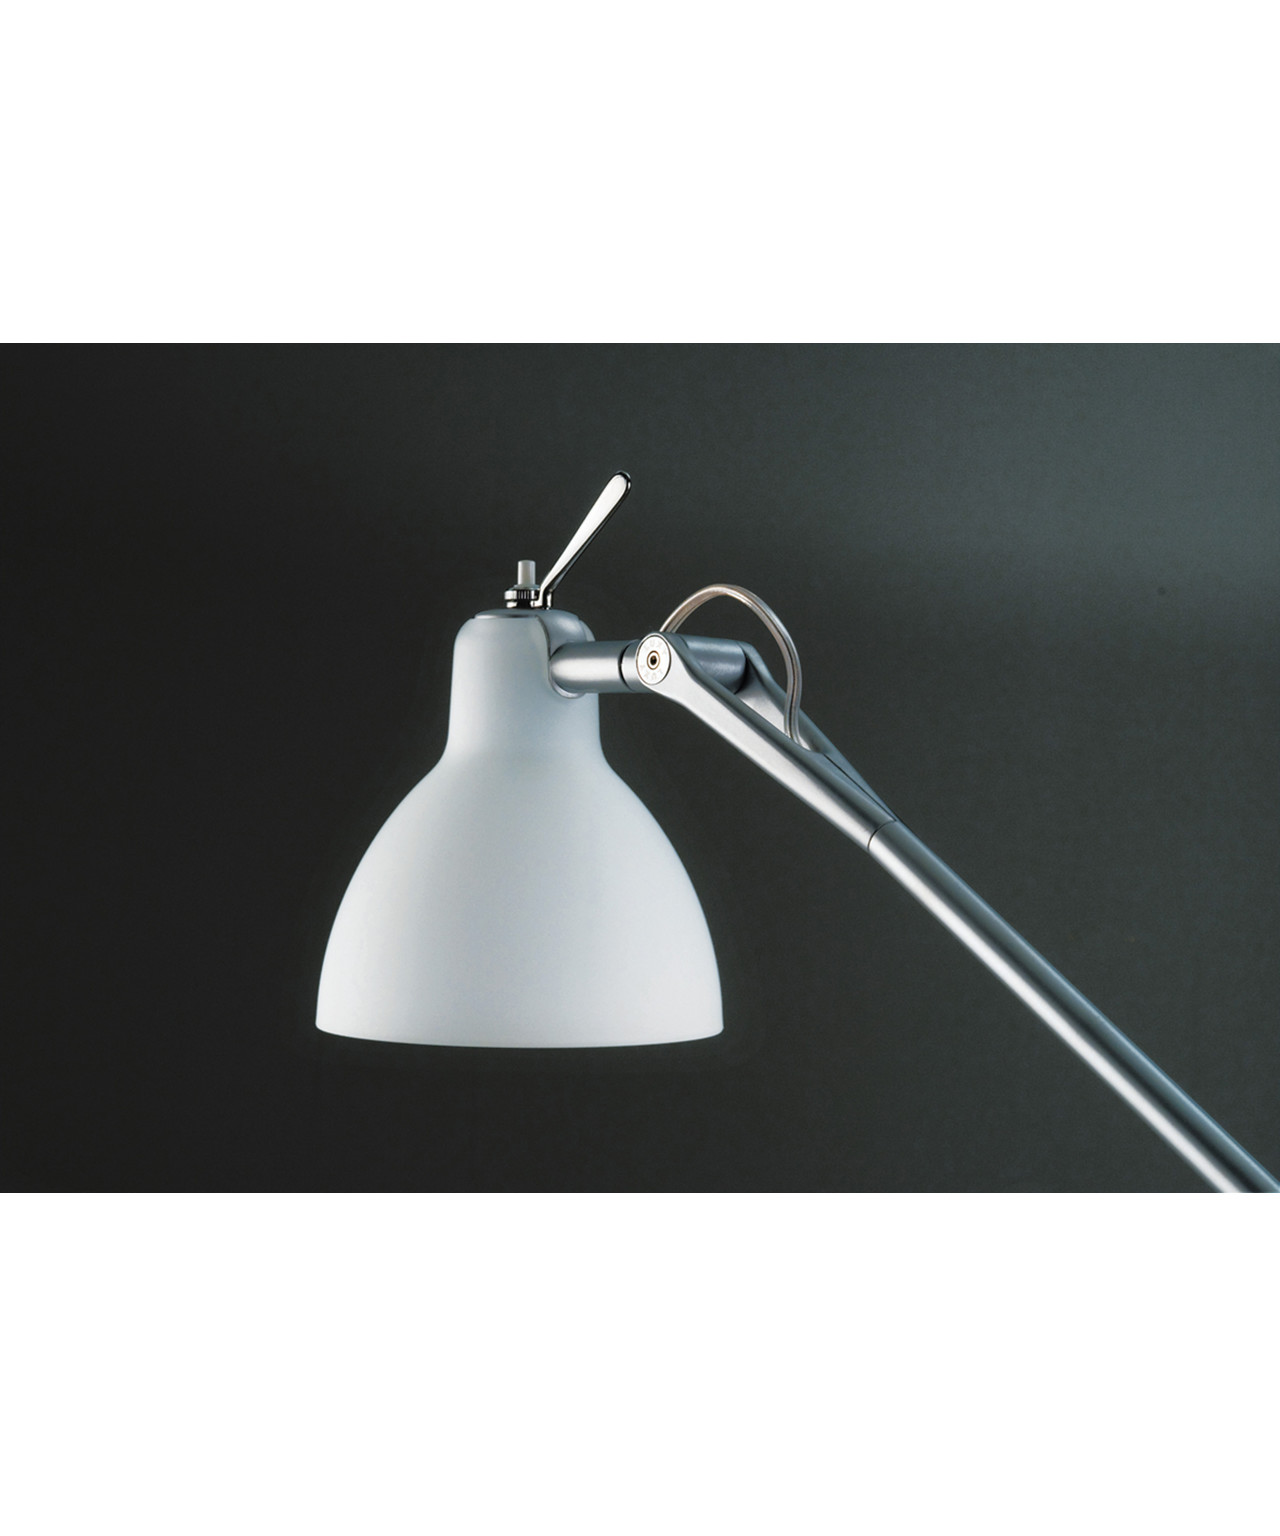 Luxy W0 Væglampe Alu/Blank Hvid - Rotaliana